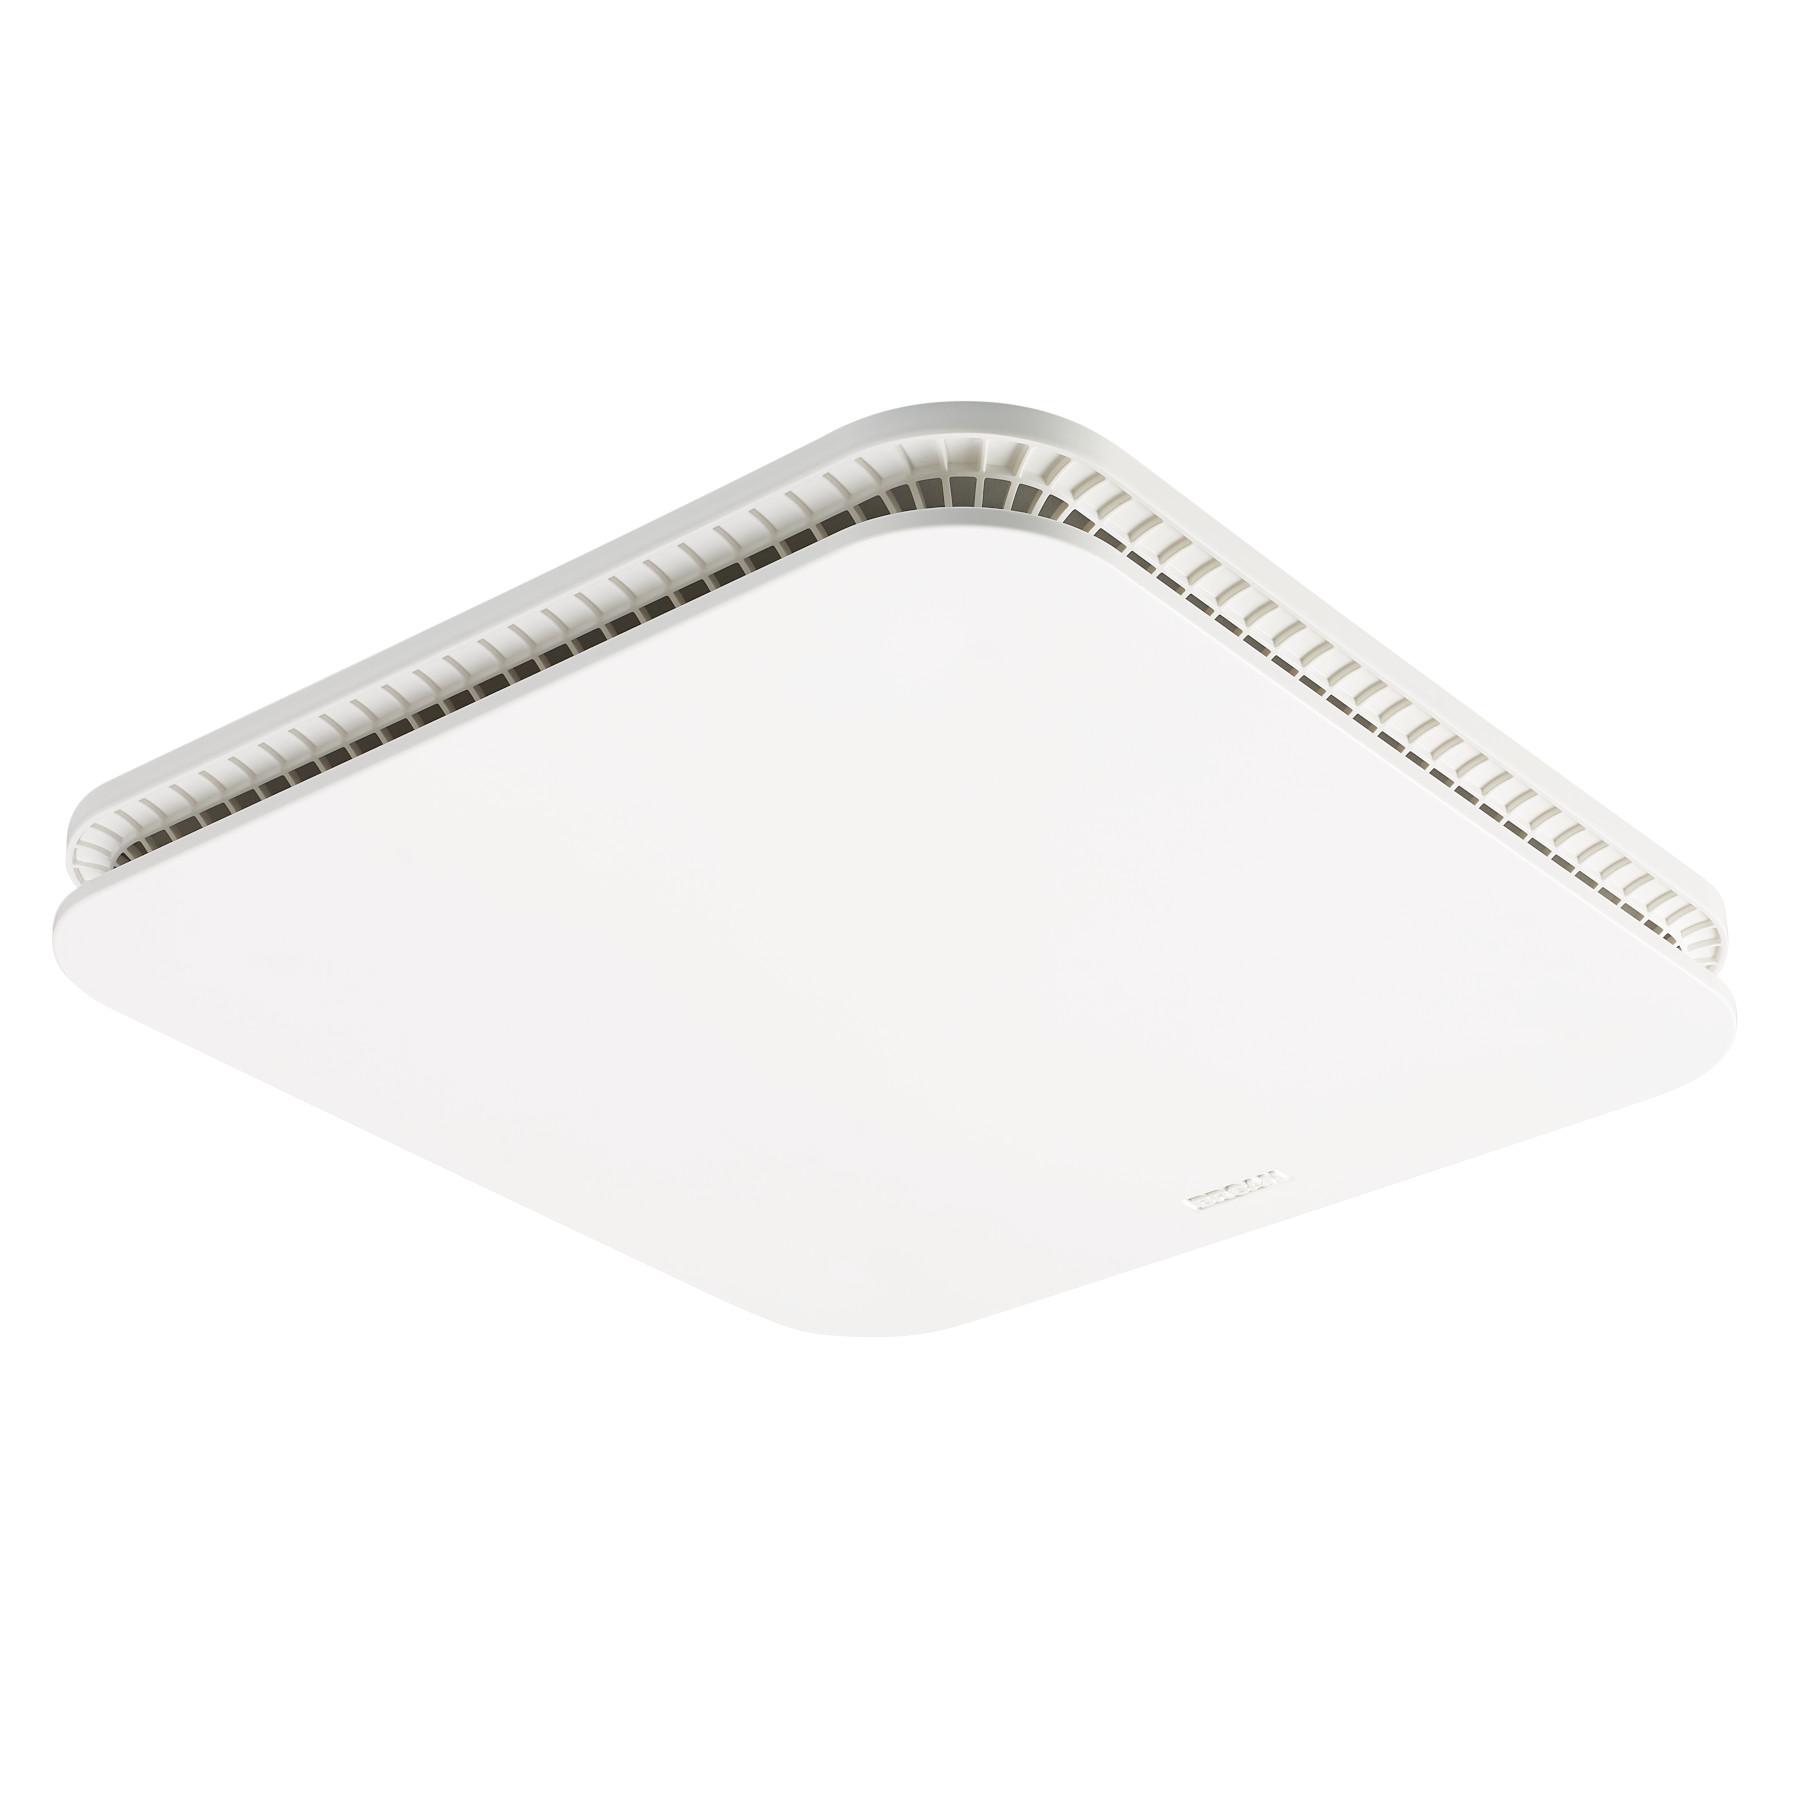 bathroom exhaust fan upgrade grille